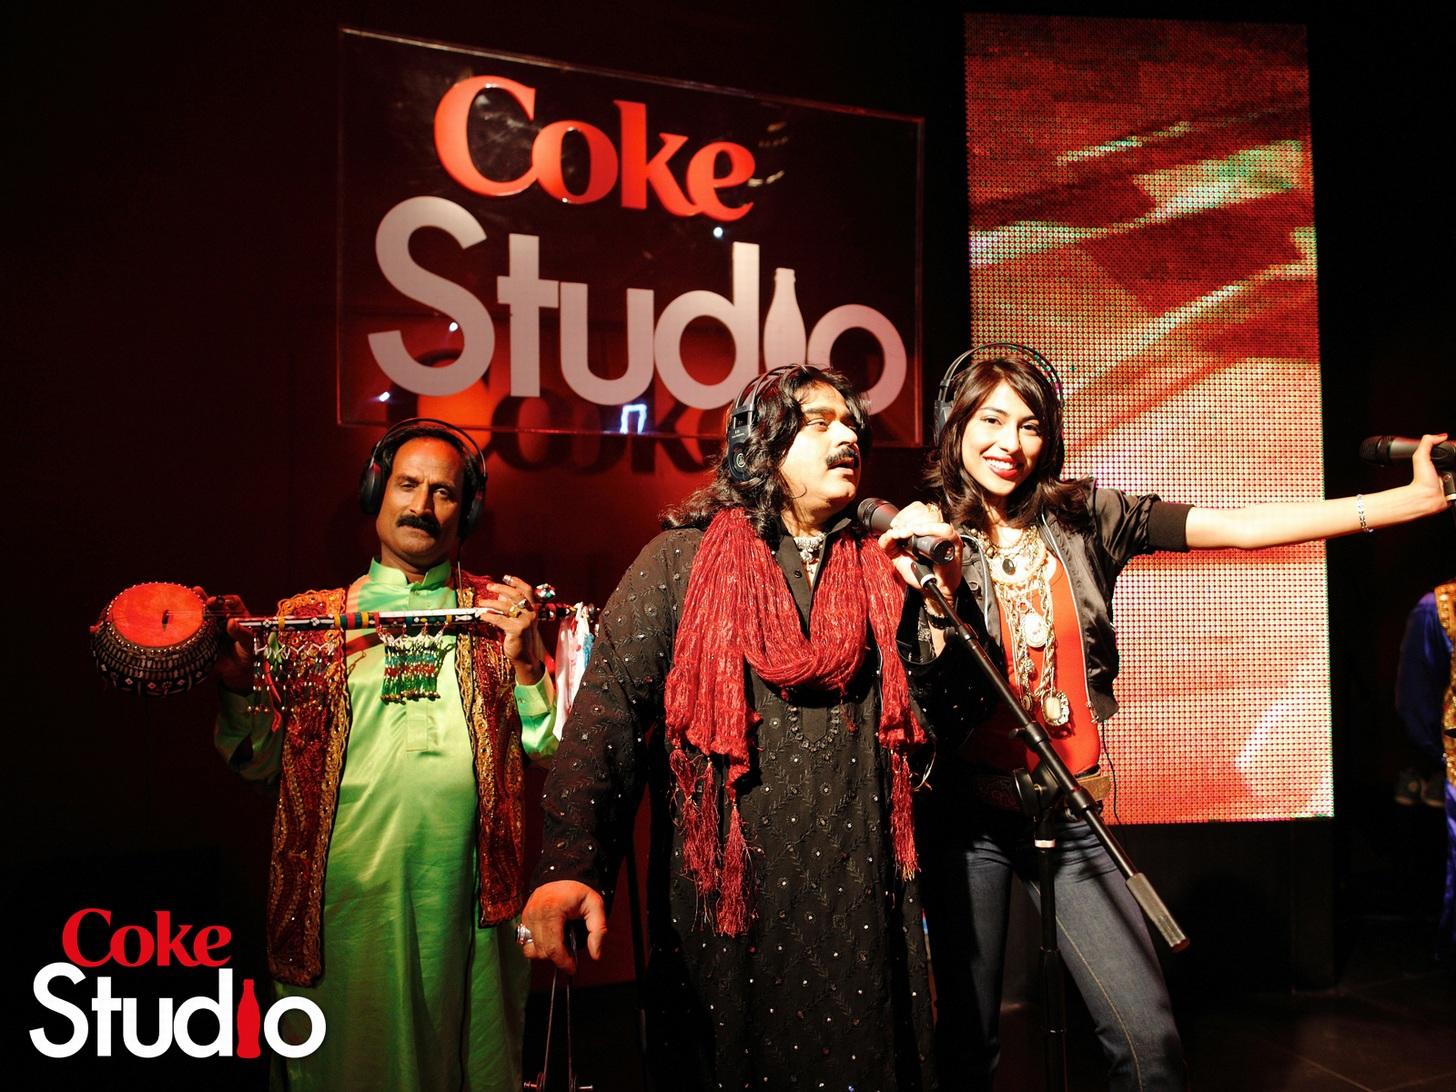 http://4.bp.blogspot.com/-bv6bcnYutFY/T-RVpxC_0bI/AAAAAAAAAU8/c0jLwbIRnu0/s1600/arif-lohar-meesha-shafi-coke-studio.jpg